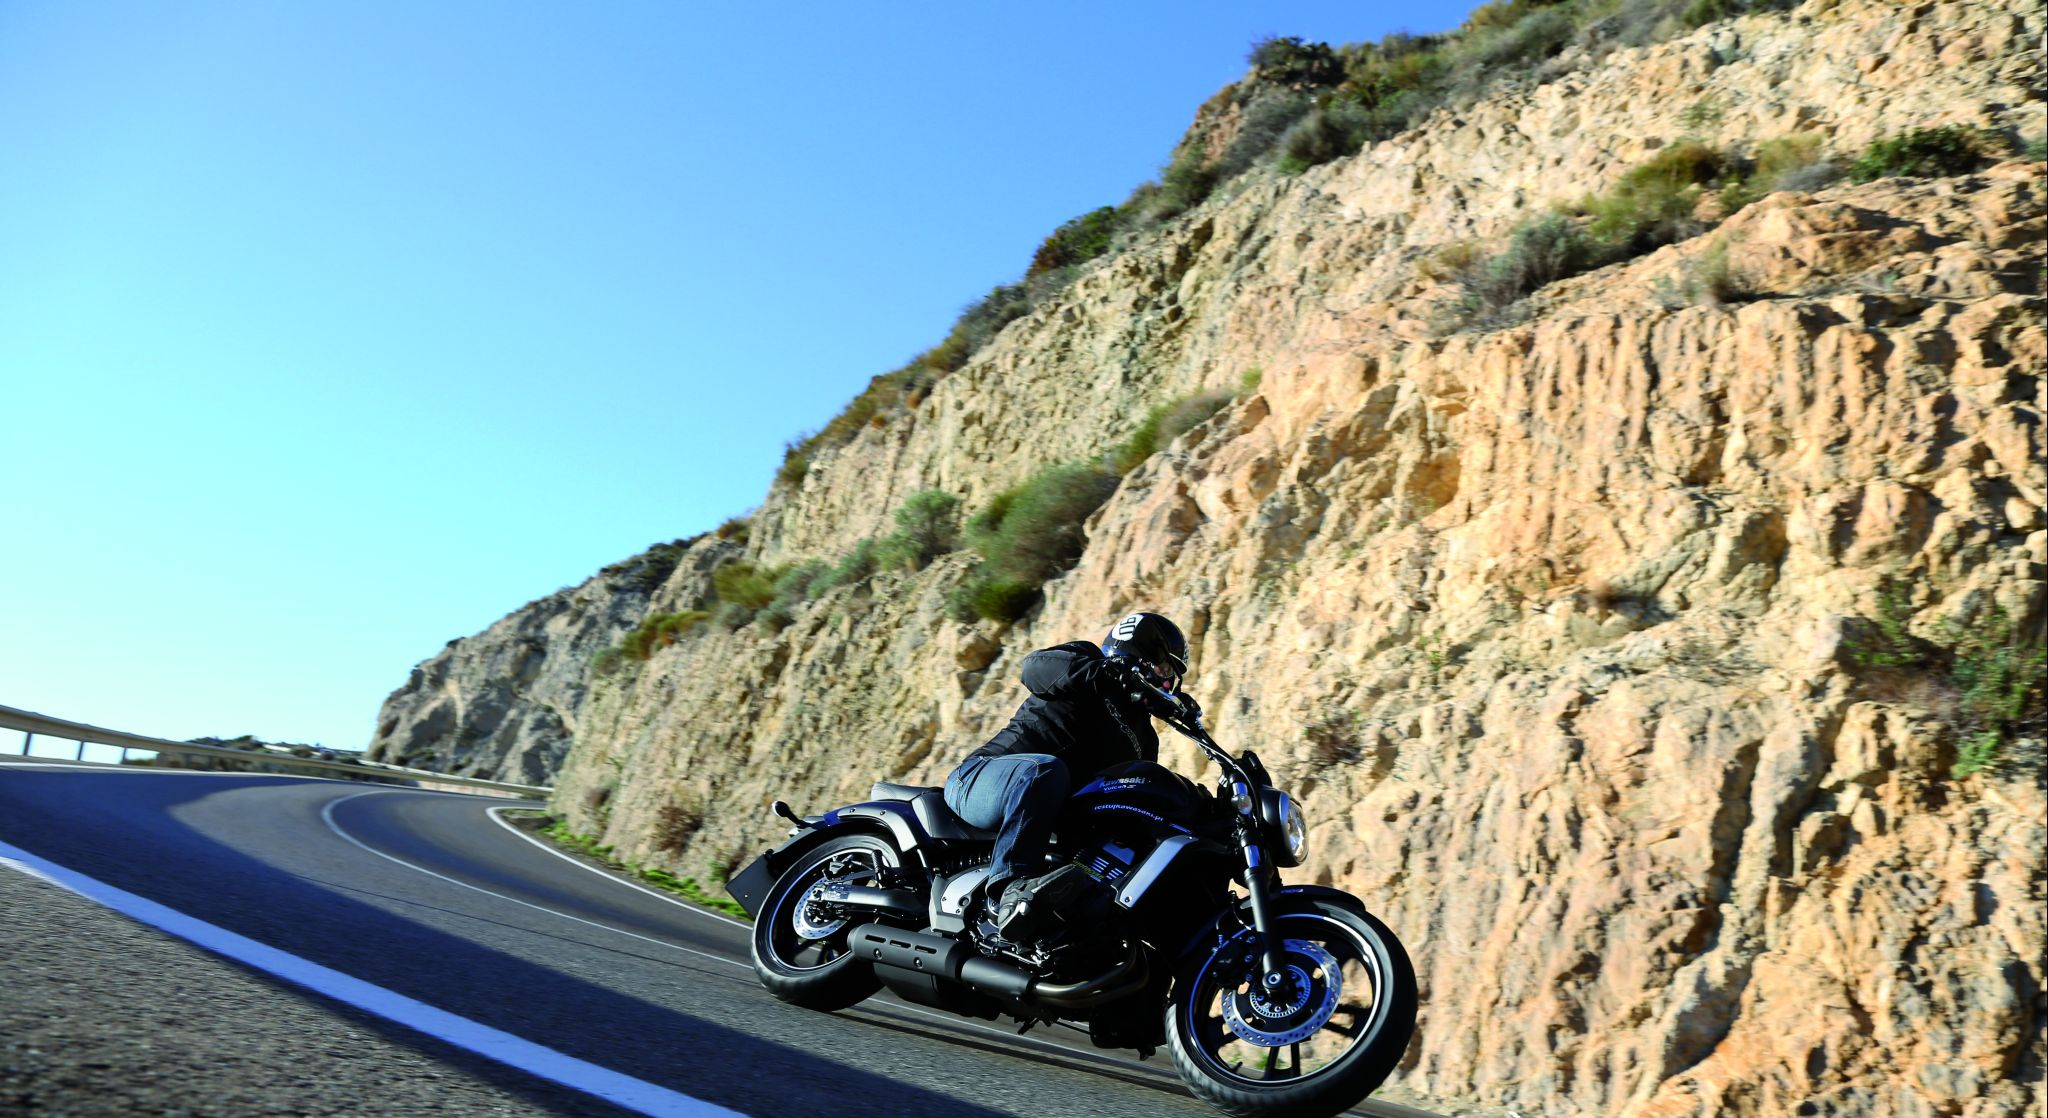 Kawasaki Vulcan S Motocykl dla niskich osób